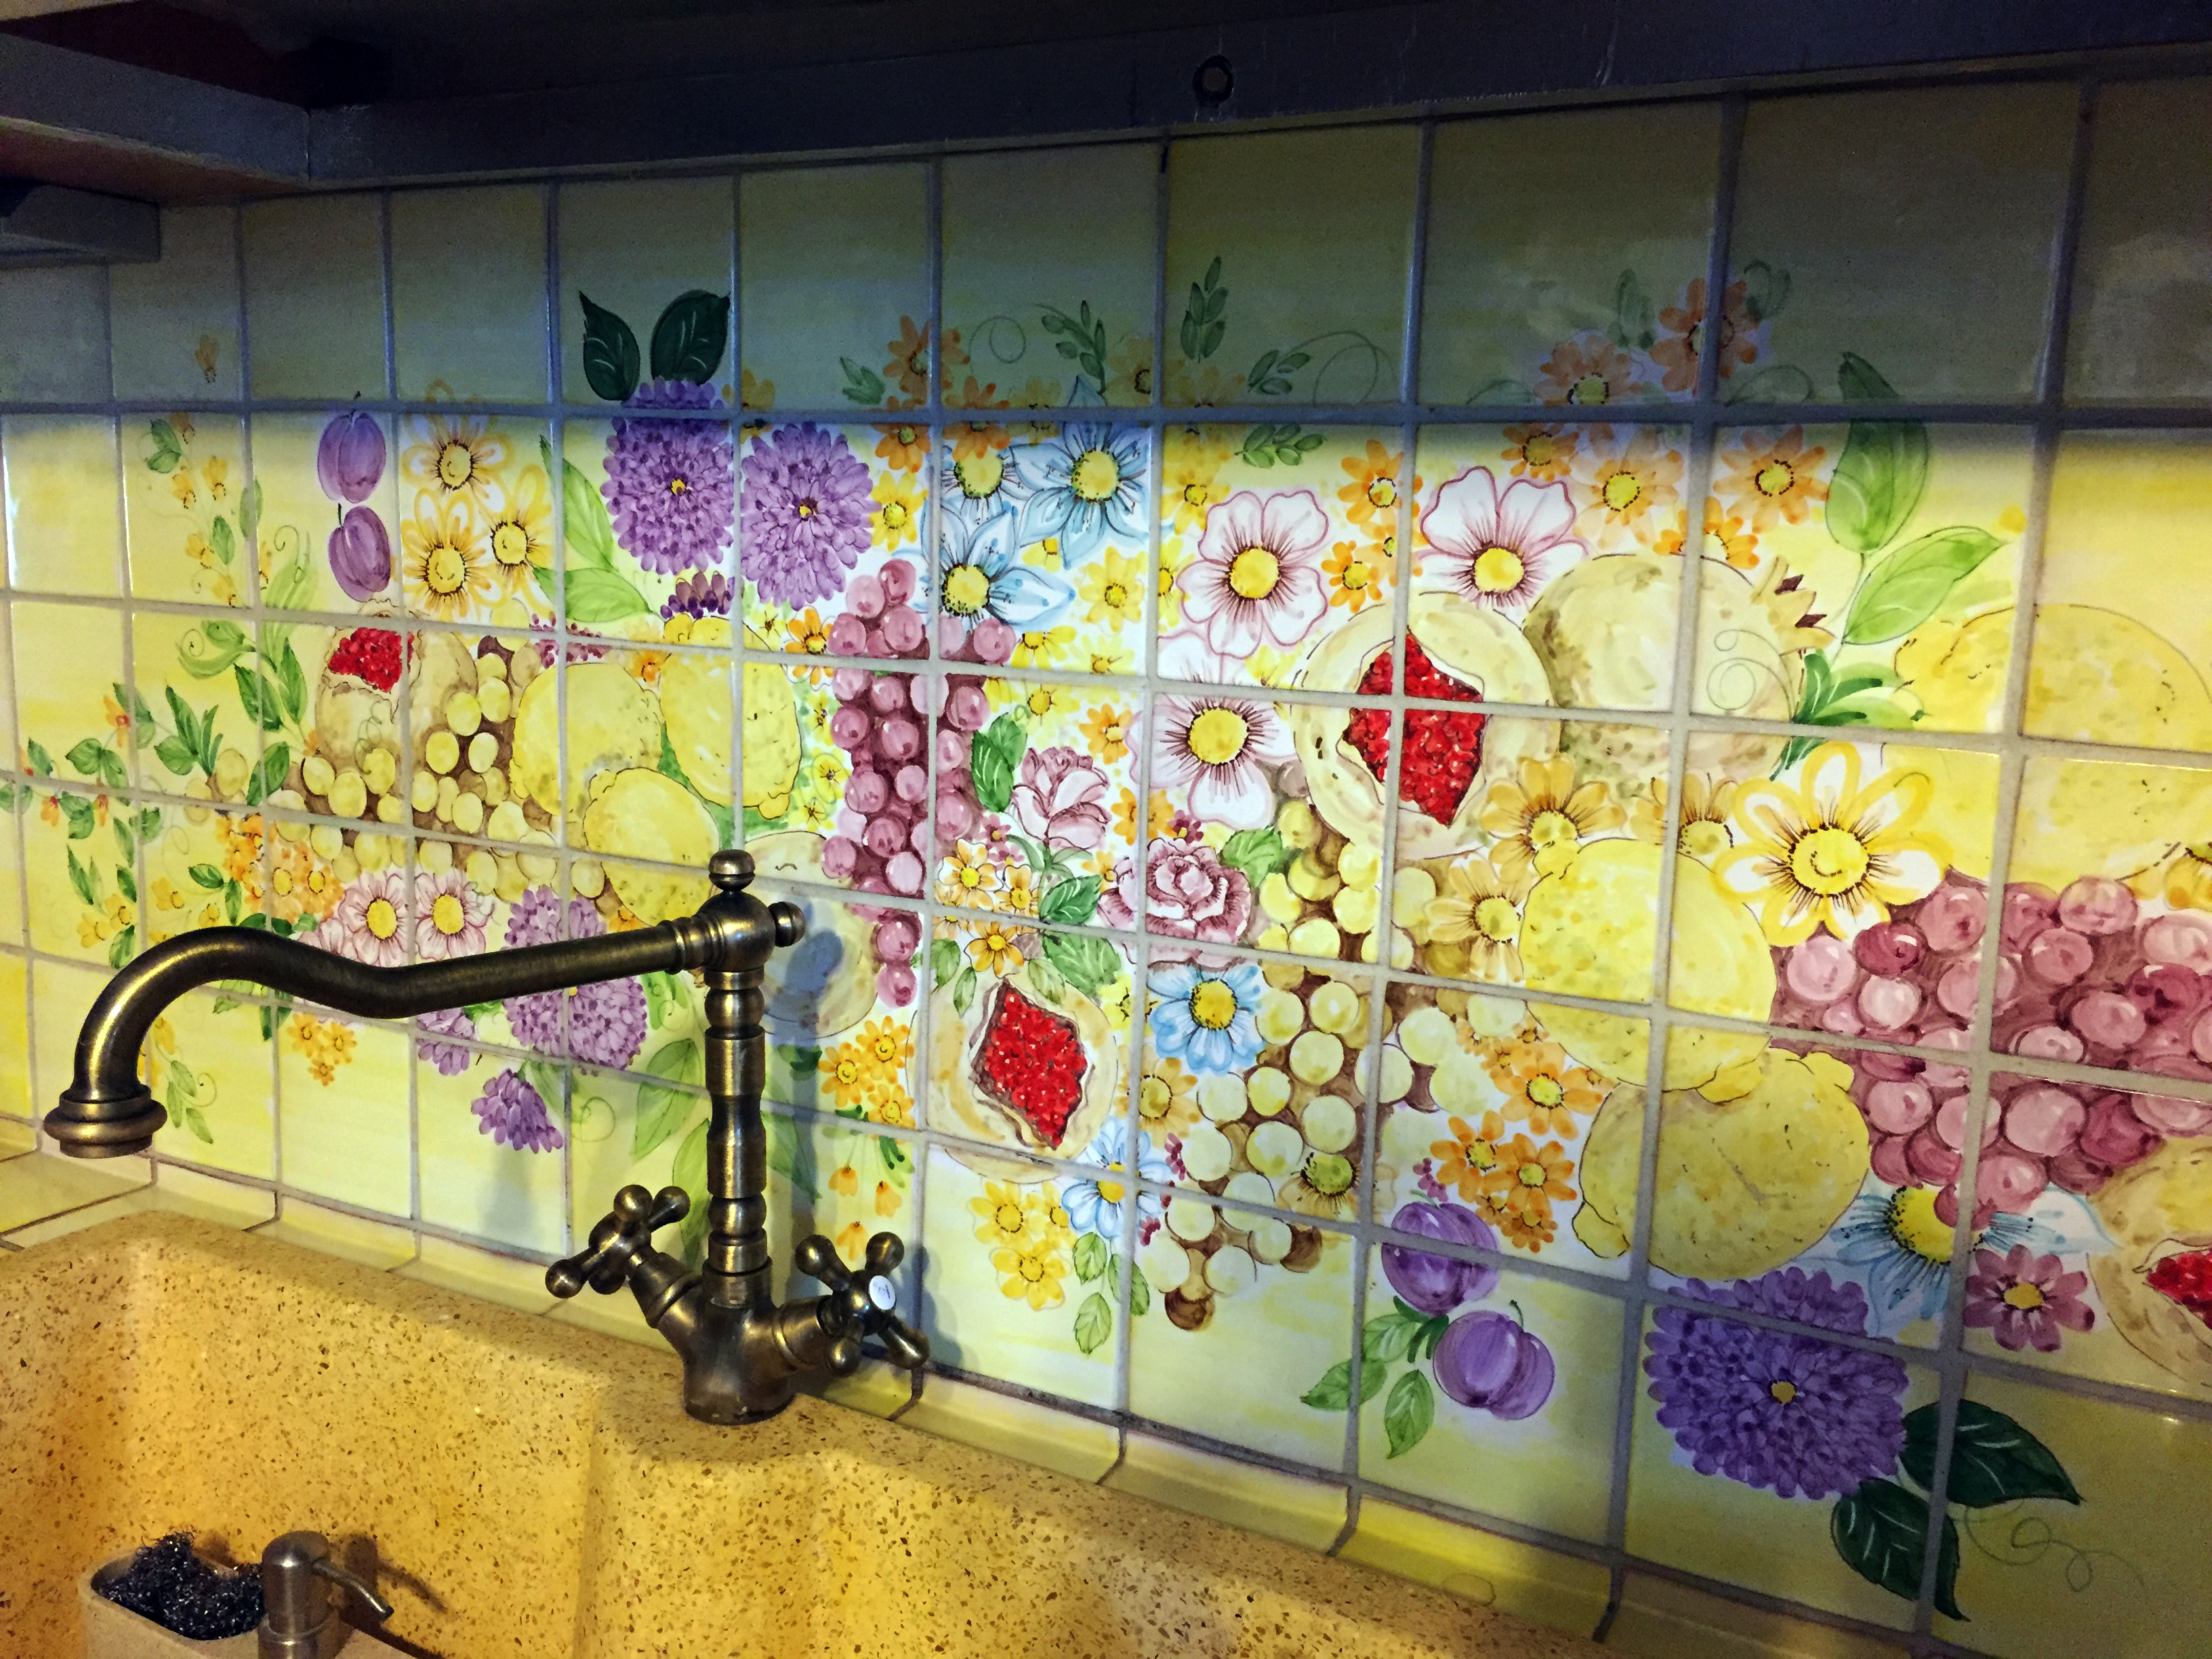 Awesome piastrelle colorate per cucina gallery home interior ideas for Piastrelle cucina colorate